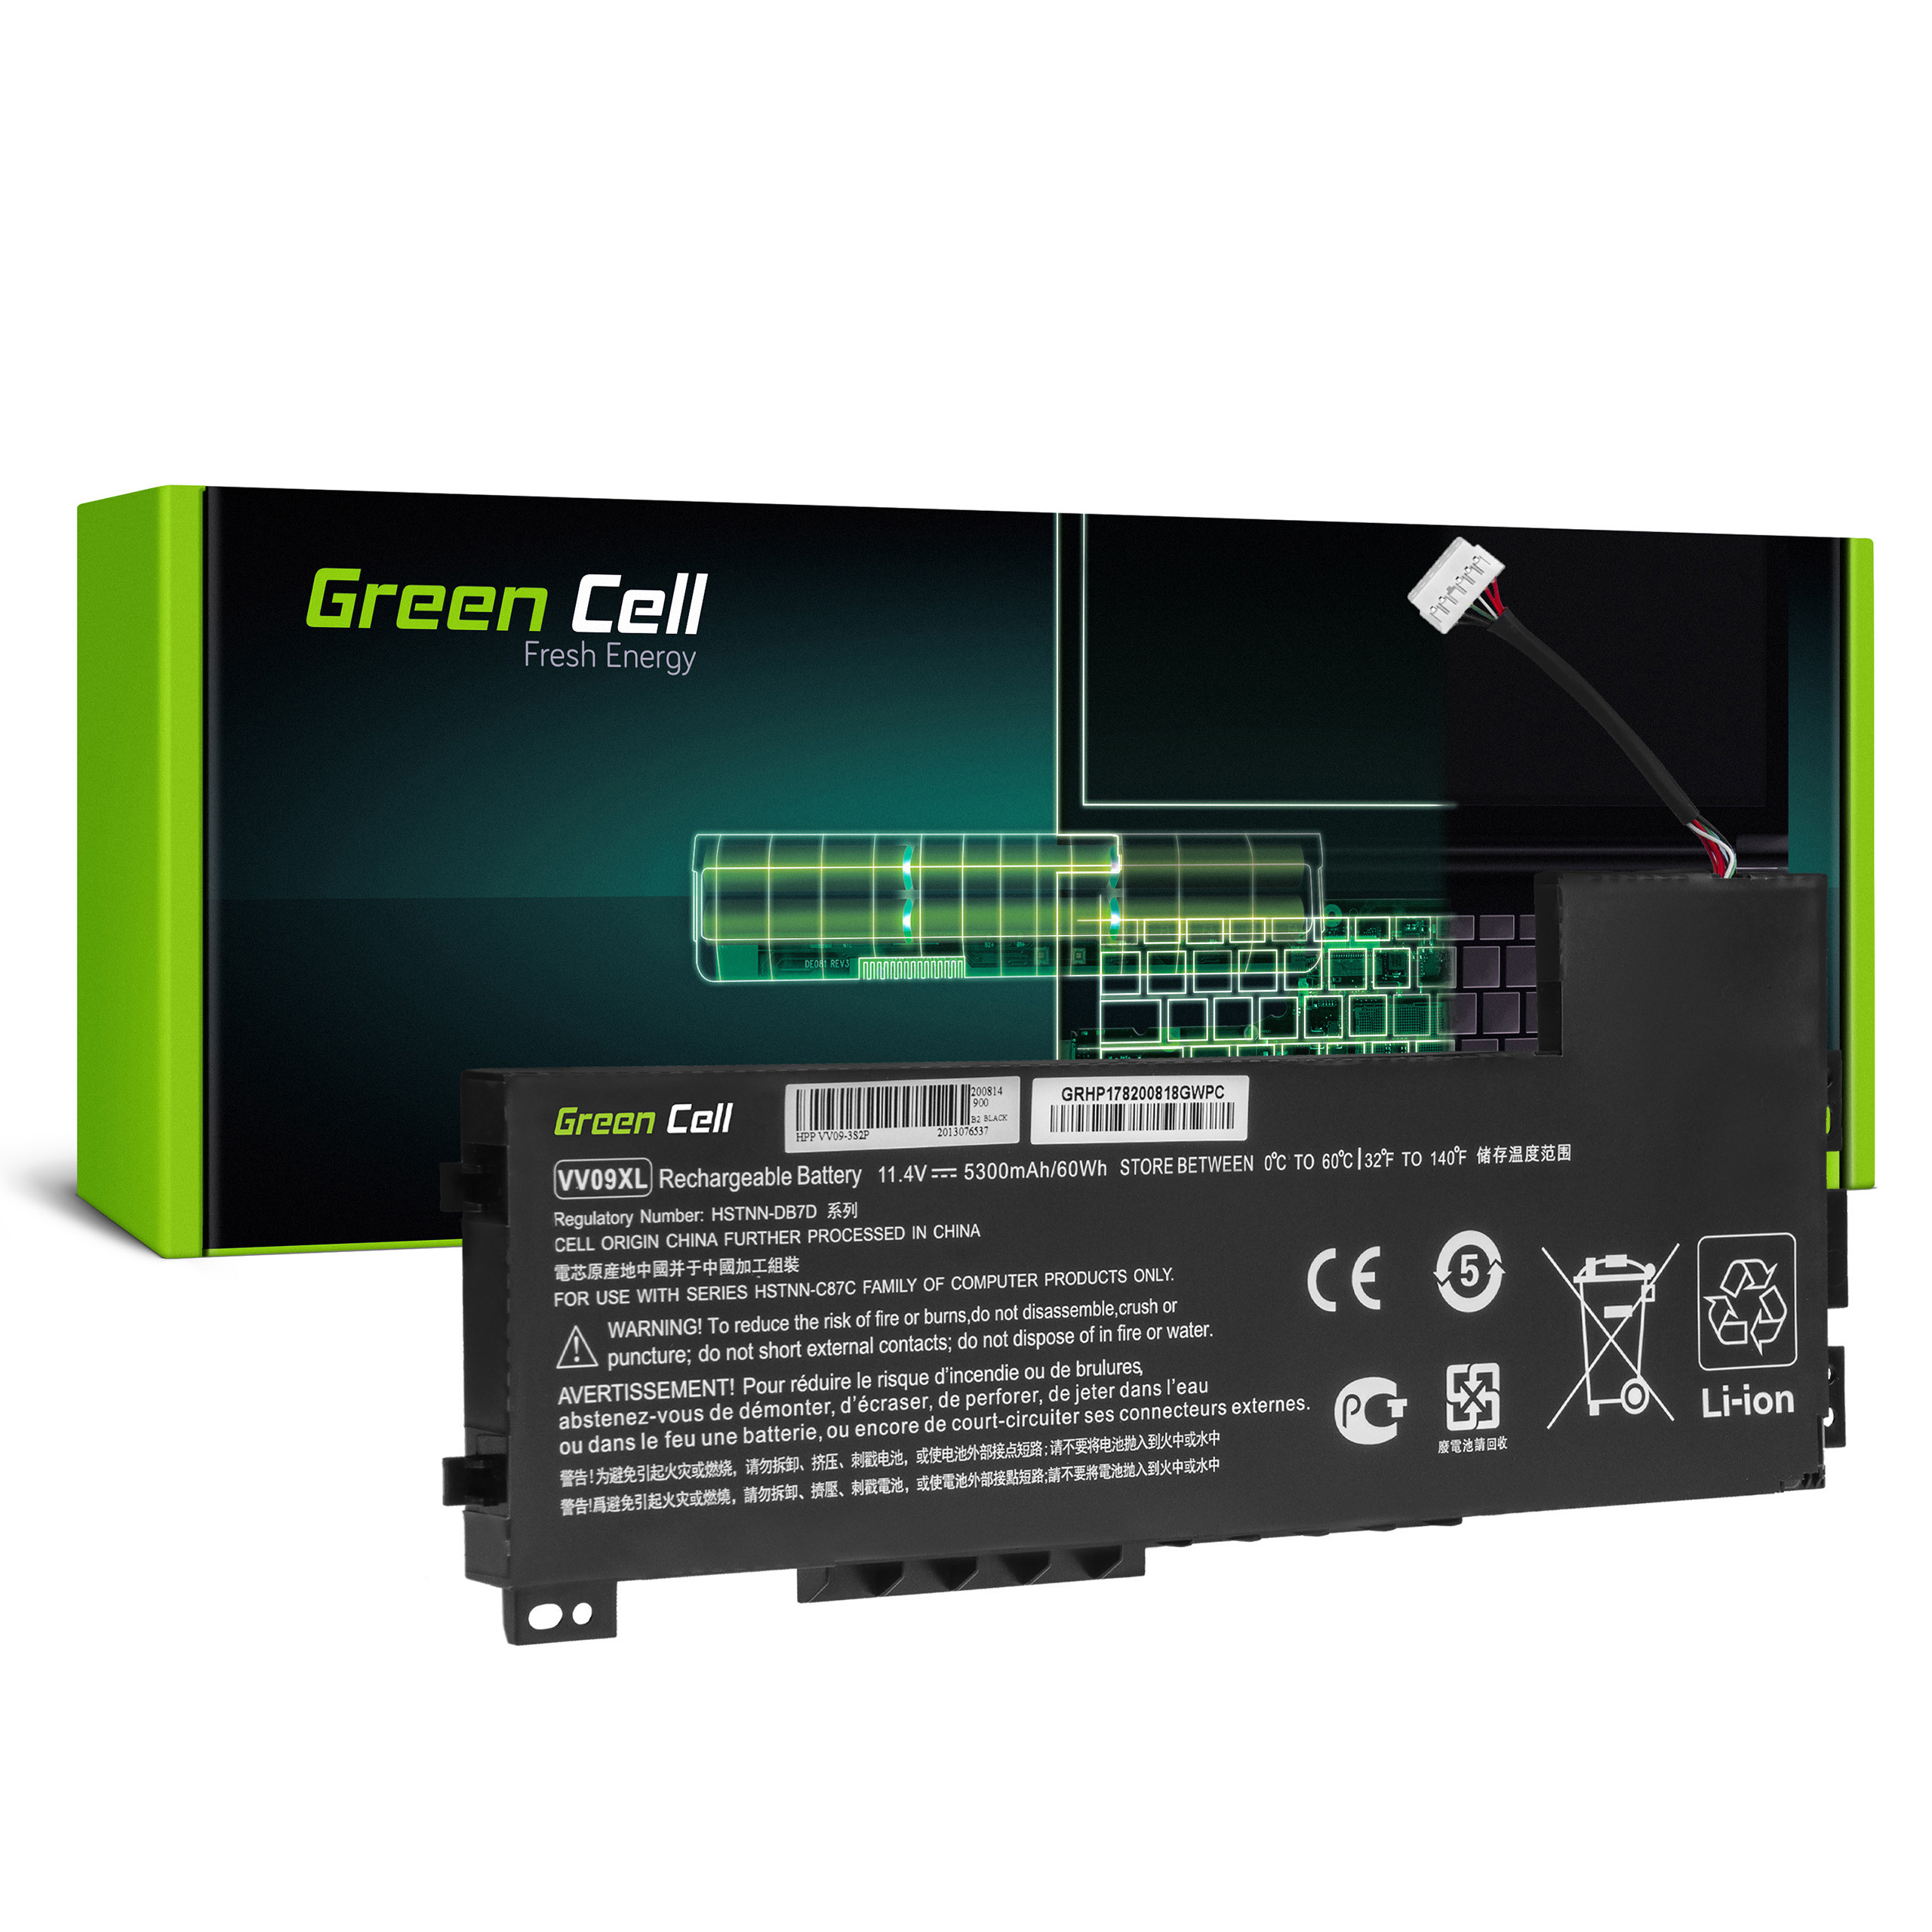 Green Cell HP178 Baterie HP VV09XL, HP ZBook 15 G3 G4 5300mAh Li-Pol - neoriginální